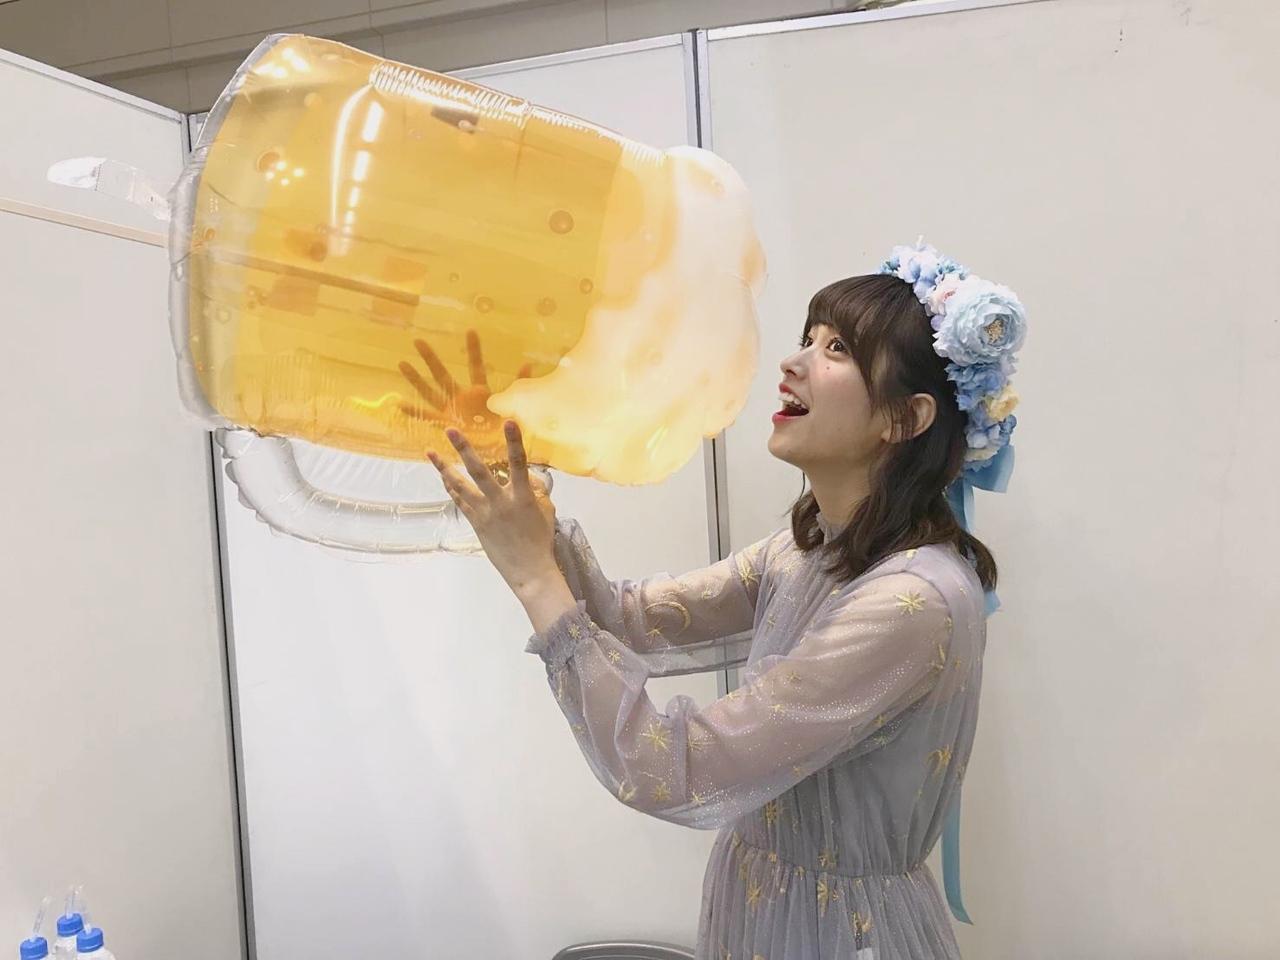 Kumi with a huge inflatable beer jug